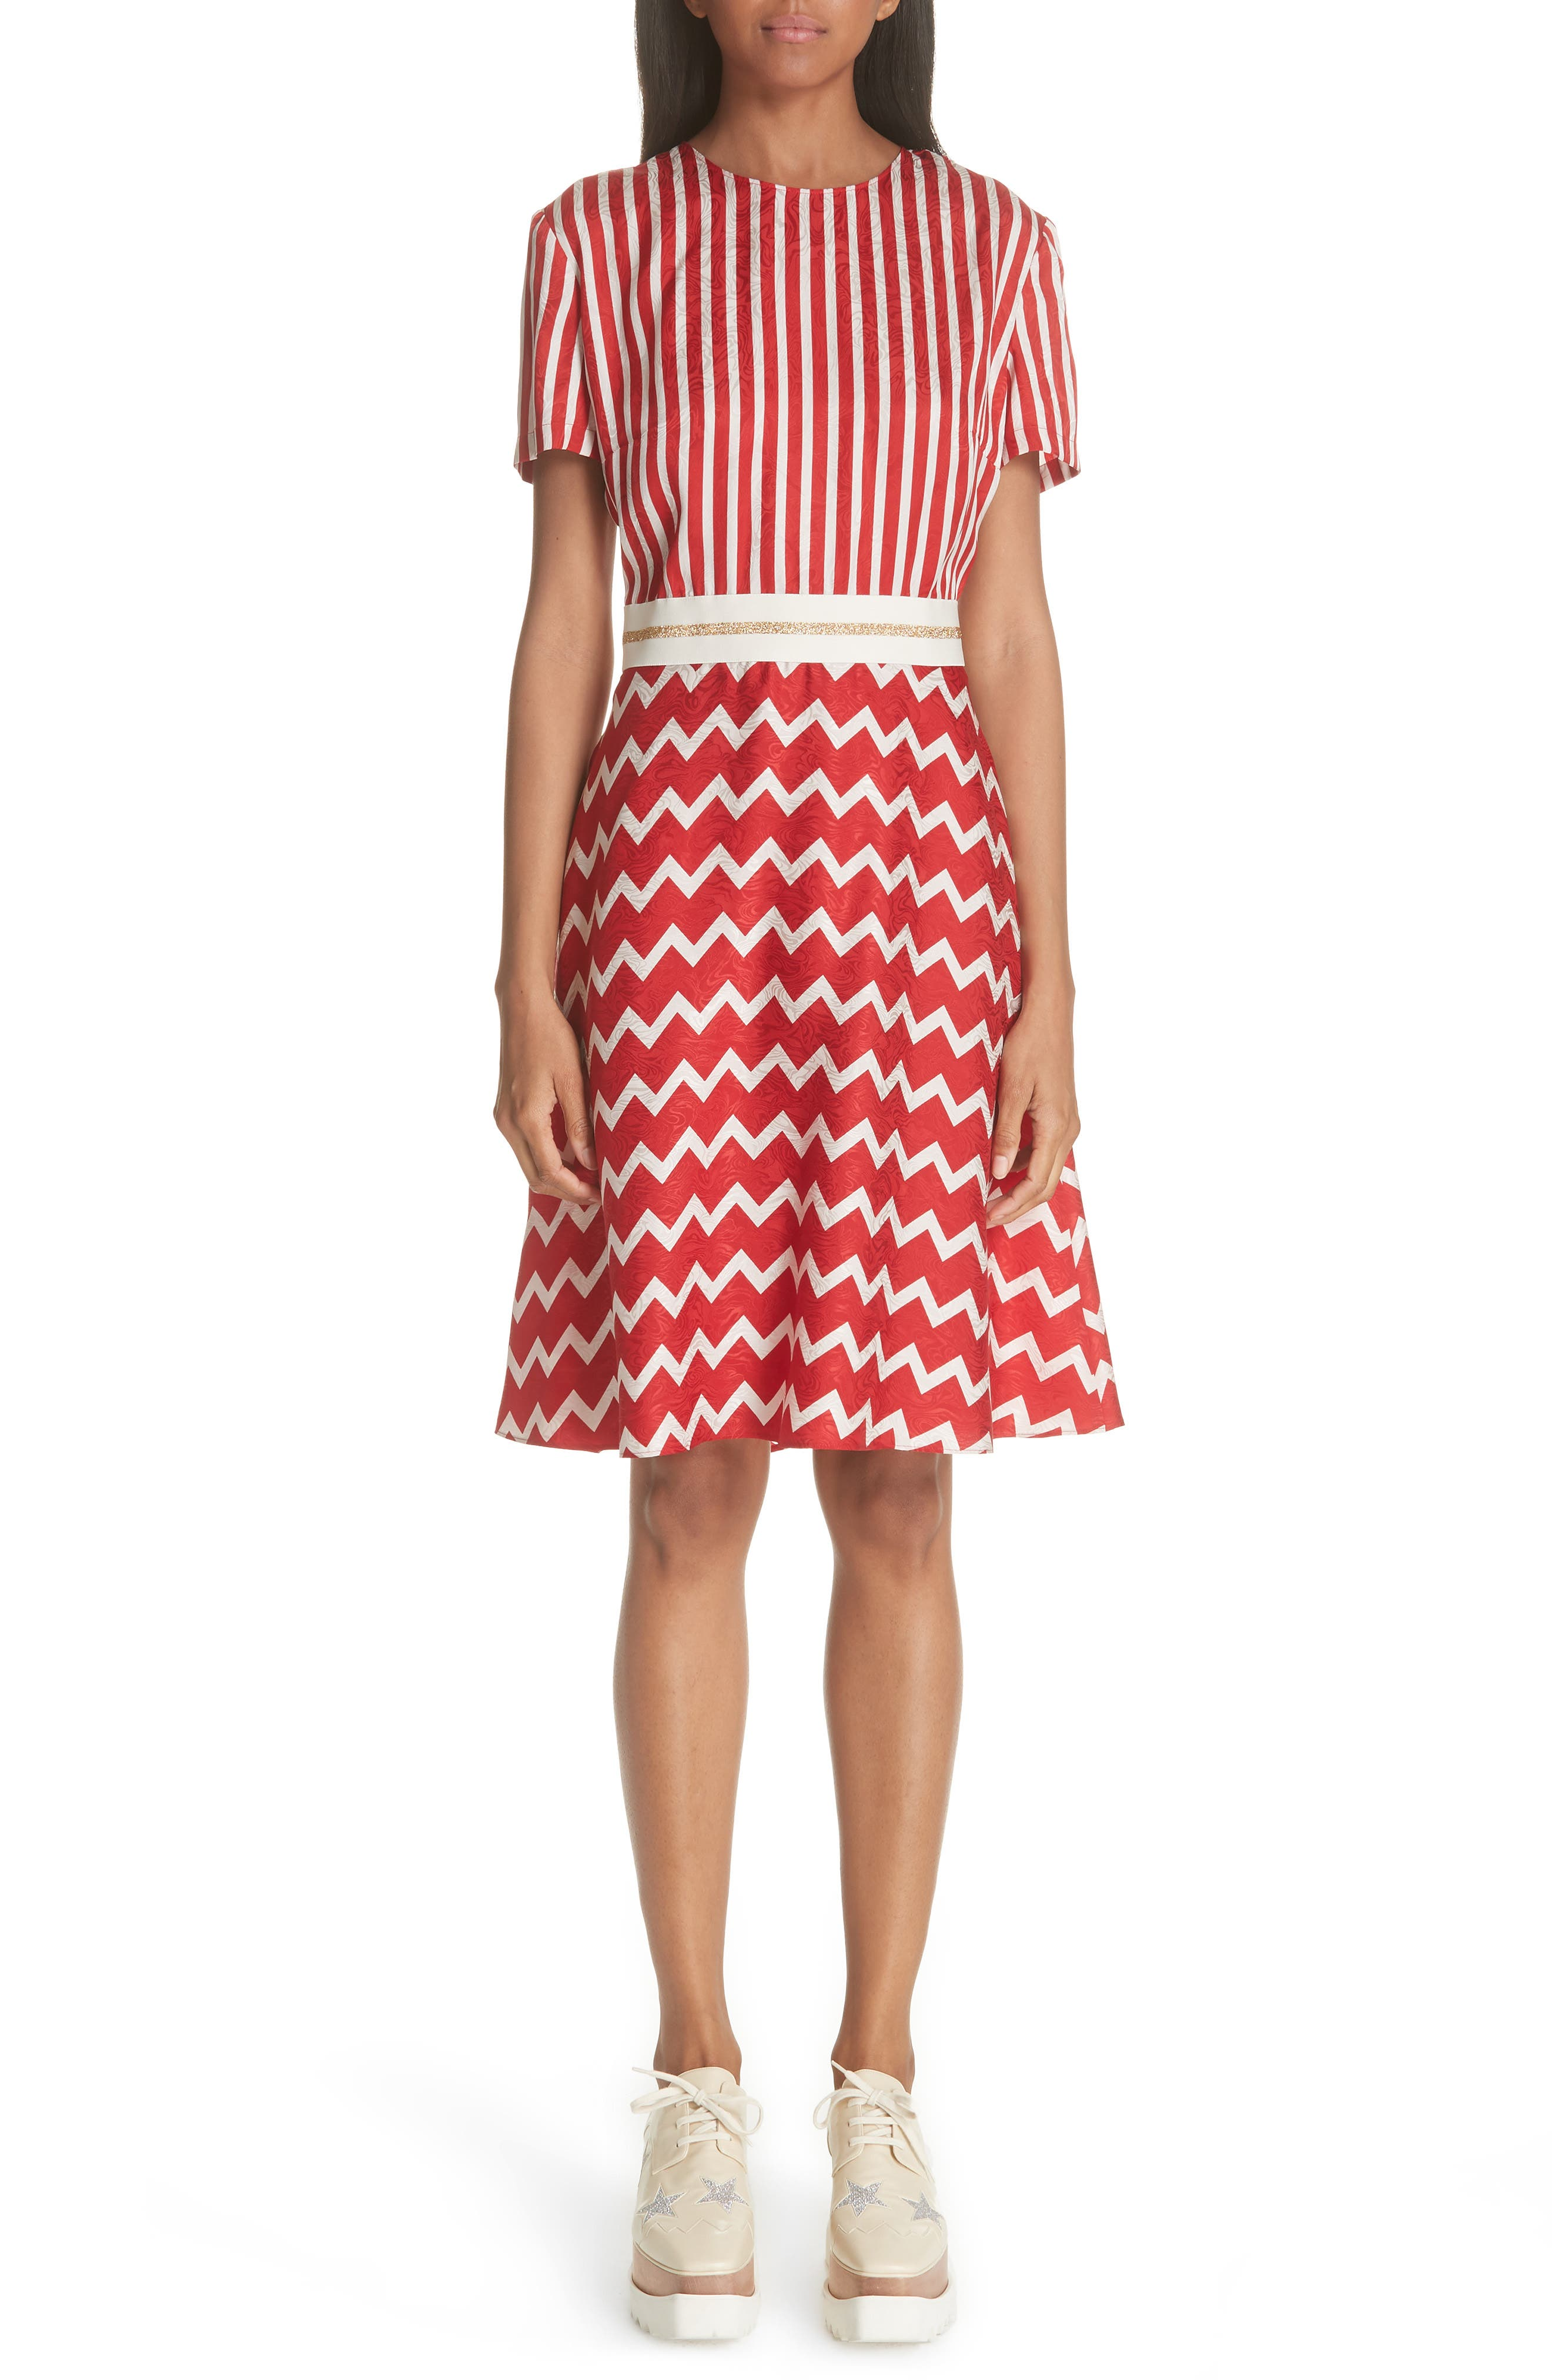 STELLA MCCARTNEY Zigzag Stripe Silk Dress, Main, color, 627